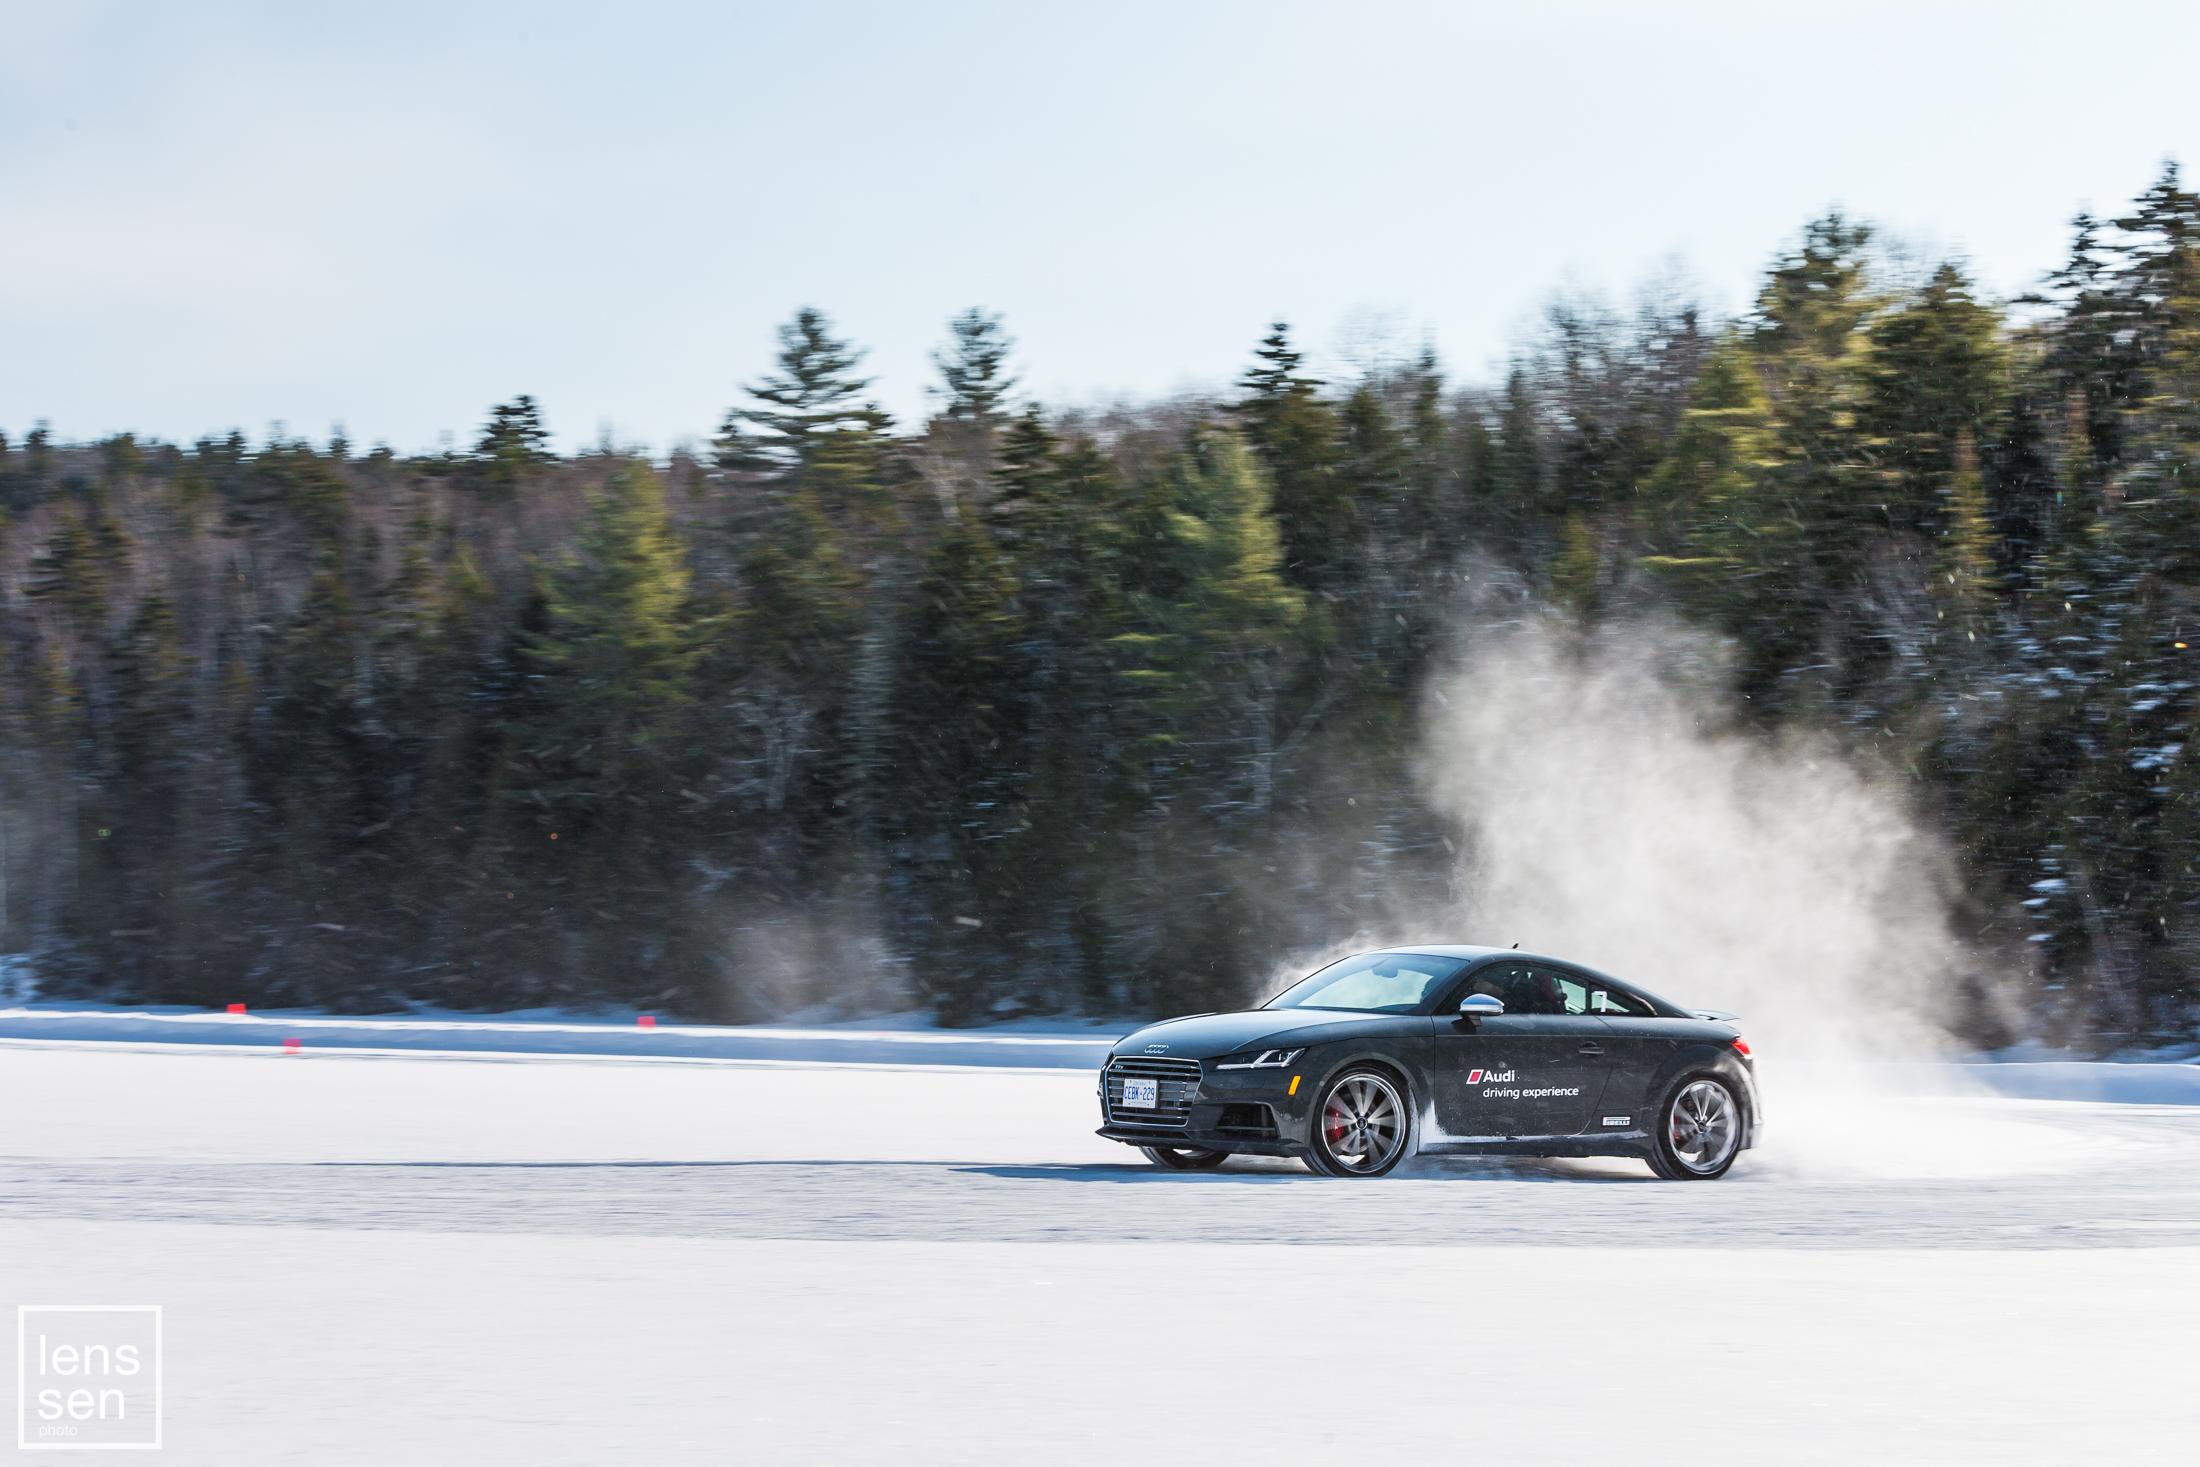 Audi Ice Experience - Sacacomie QC - Feb 2018 - 35 -1929.jpg